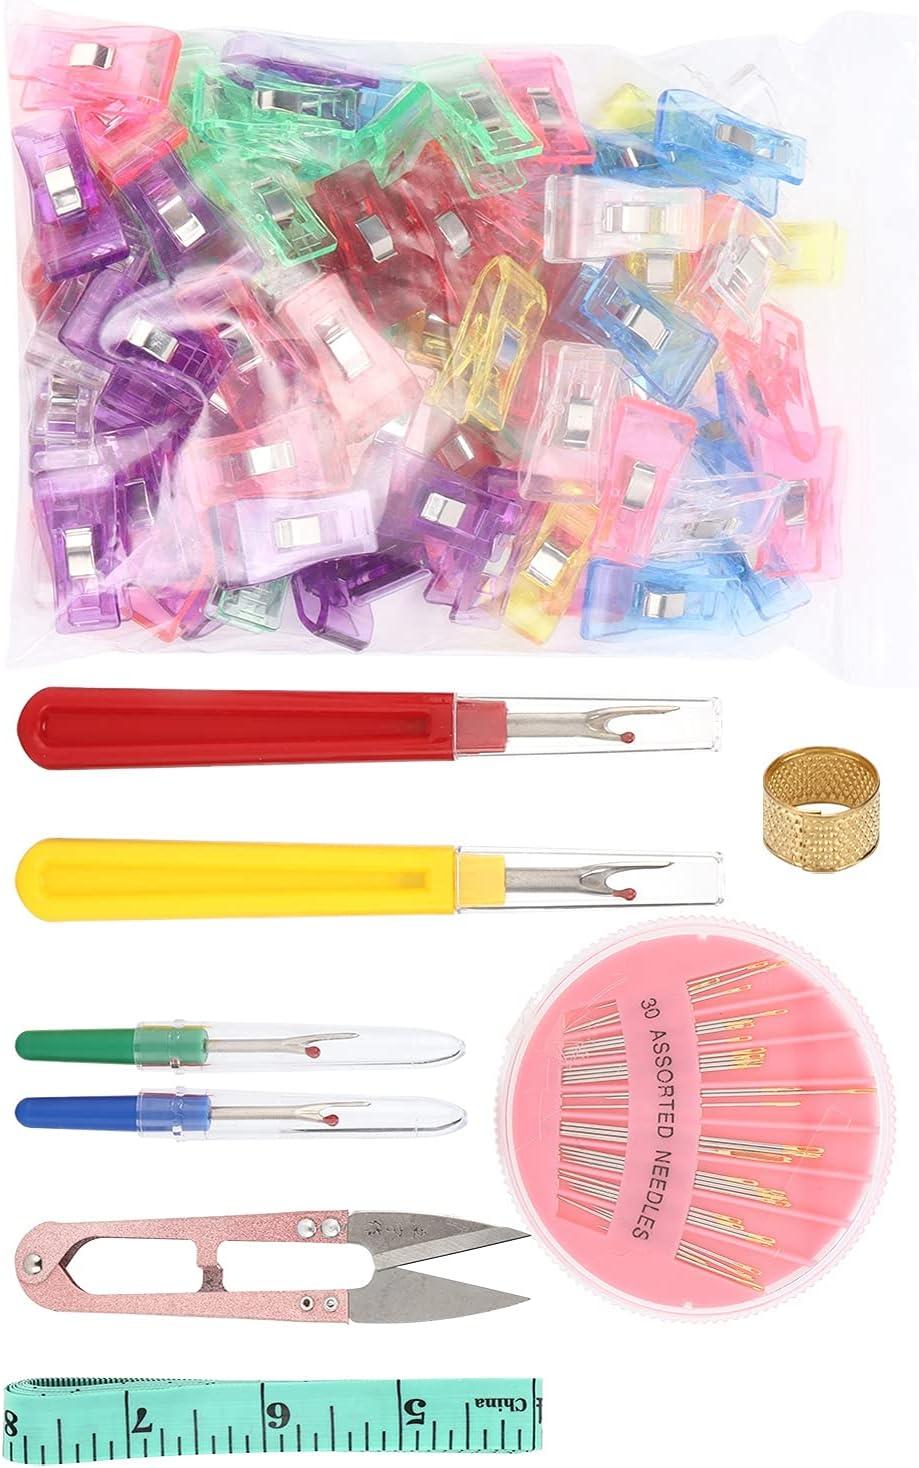 Seam Ripper Kit, Seam Remover Professional for DIY Craft